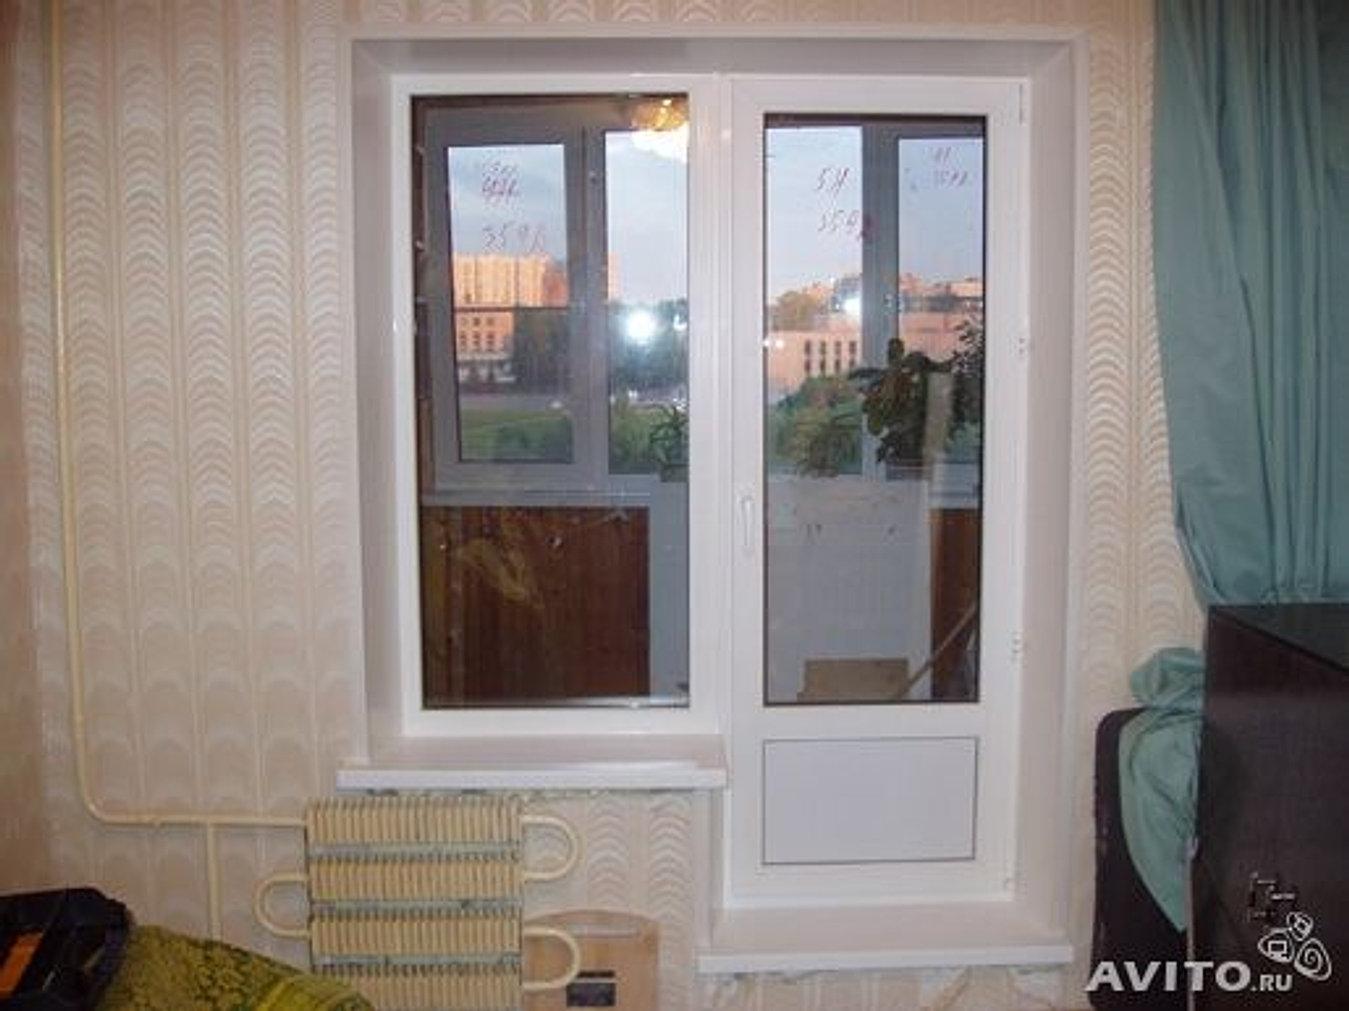 Балкон конфигурация сайдинга. - мои статьи - каталог статей .